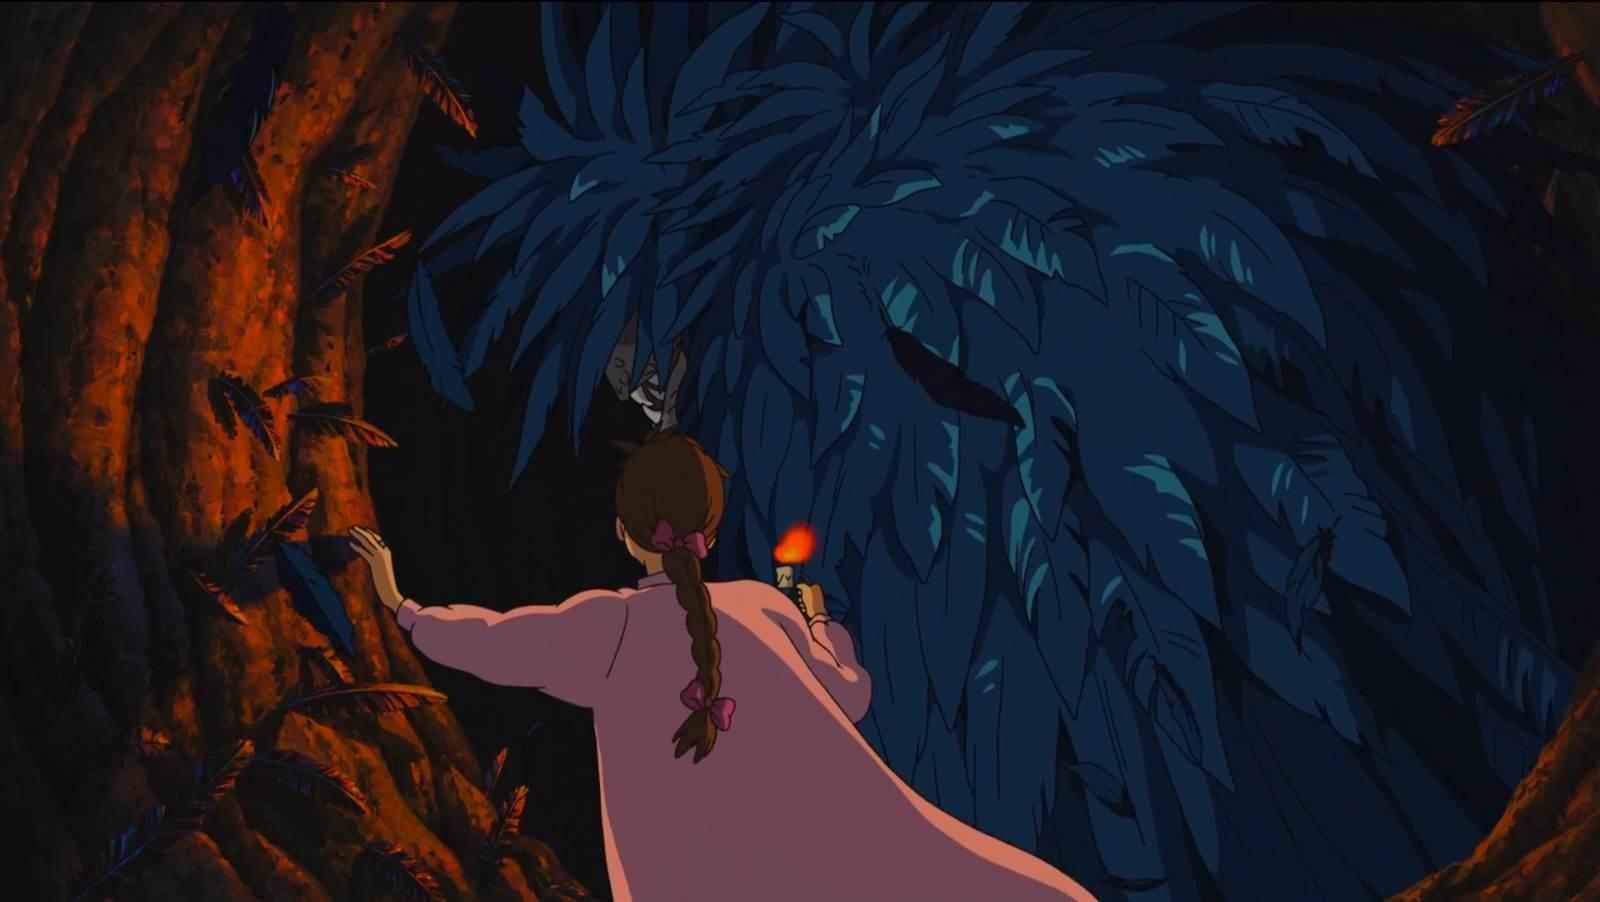 Howl no Ugoku Shiro, Howl in bird form